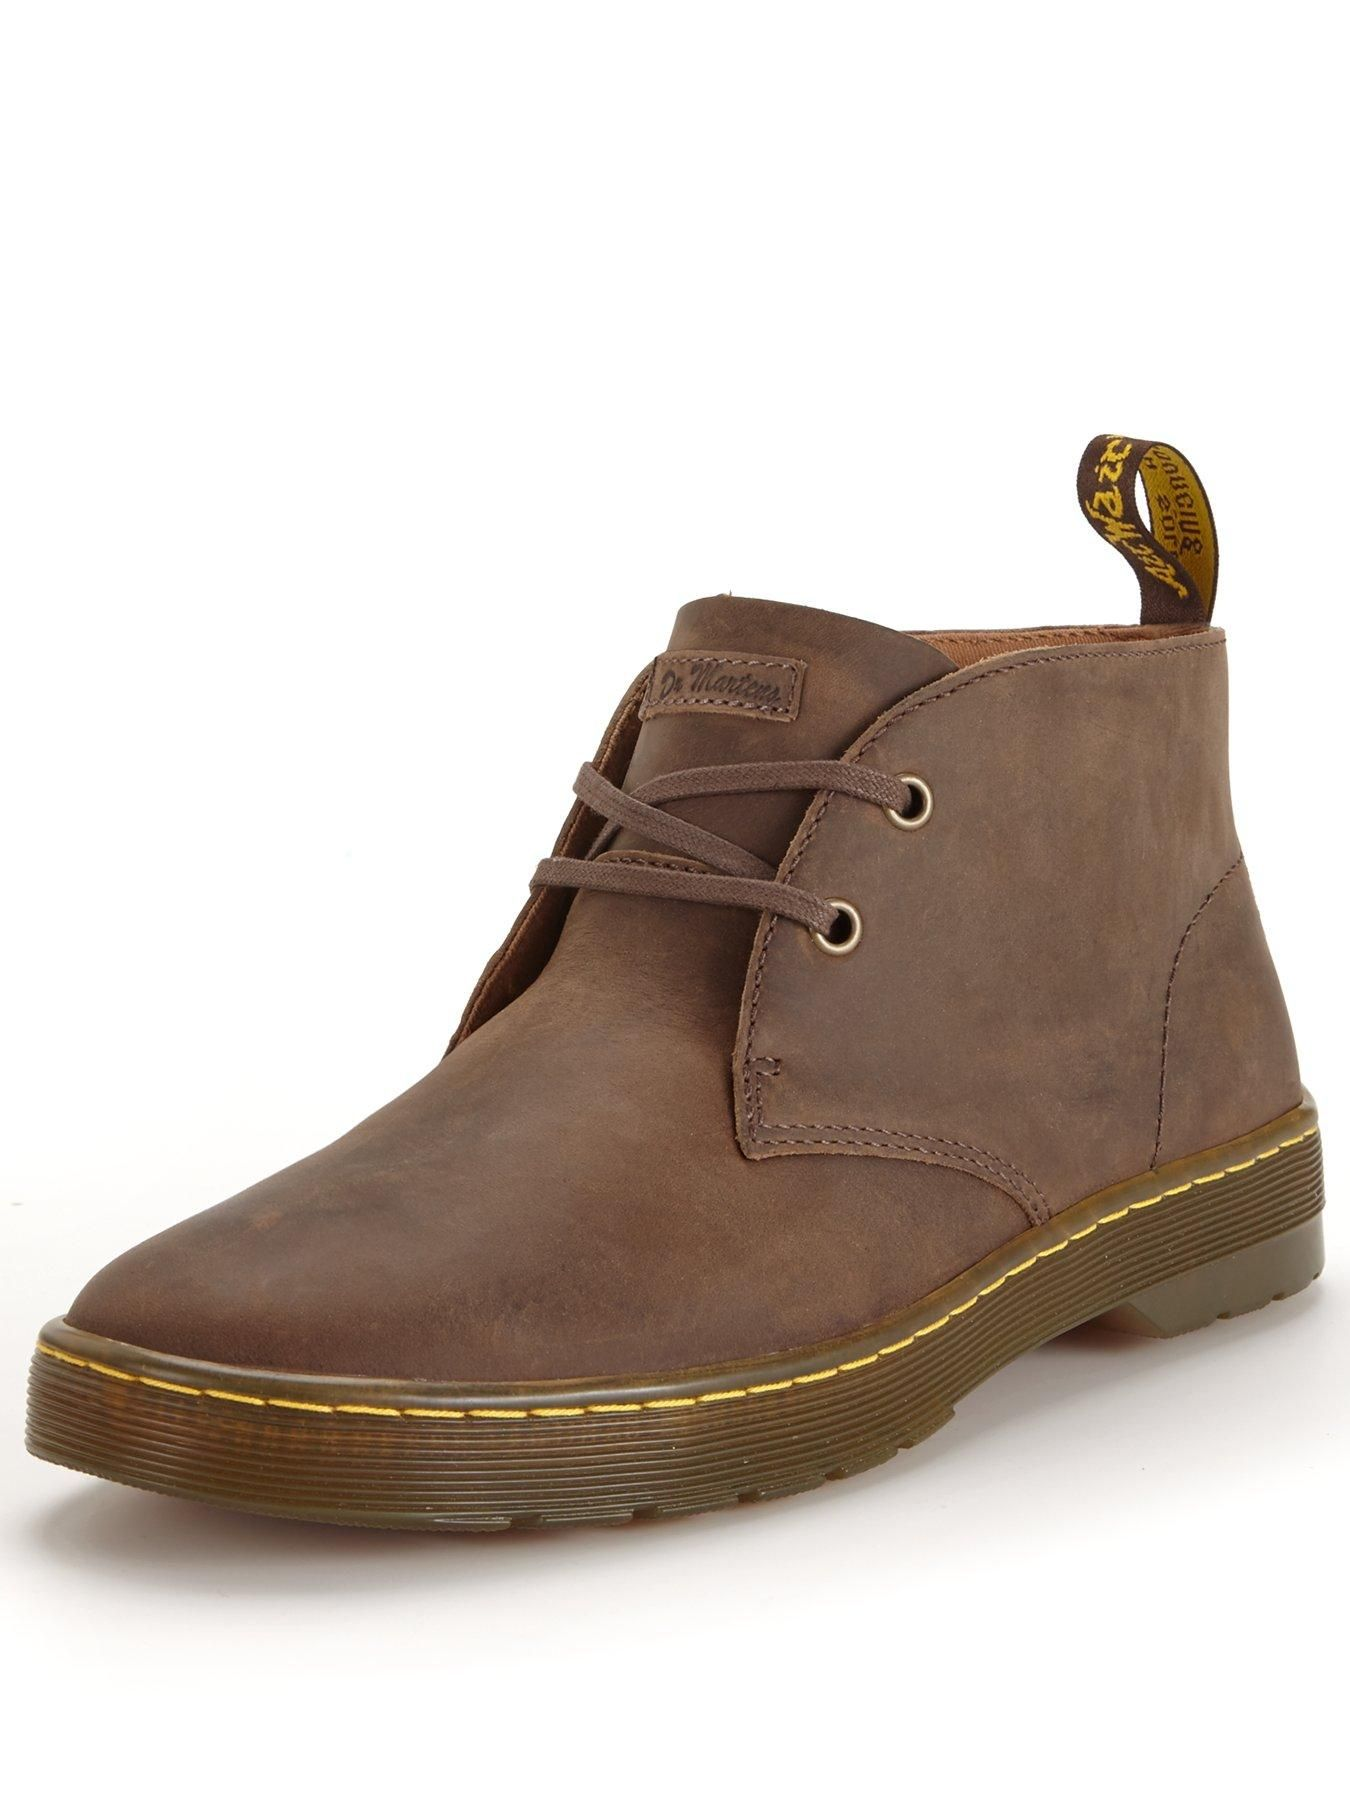 Cruise Cabrillo Chukka boot Gaucho | Boots, Dr martens